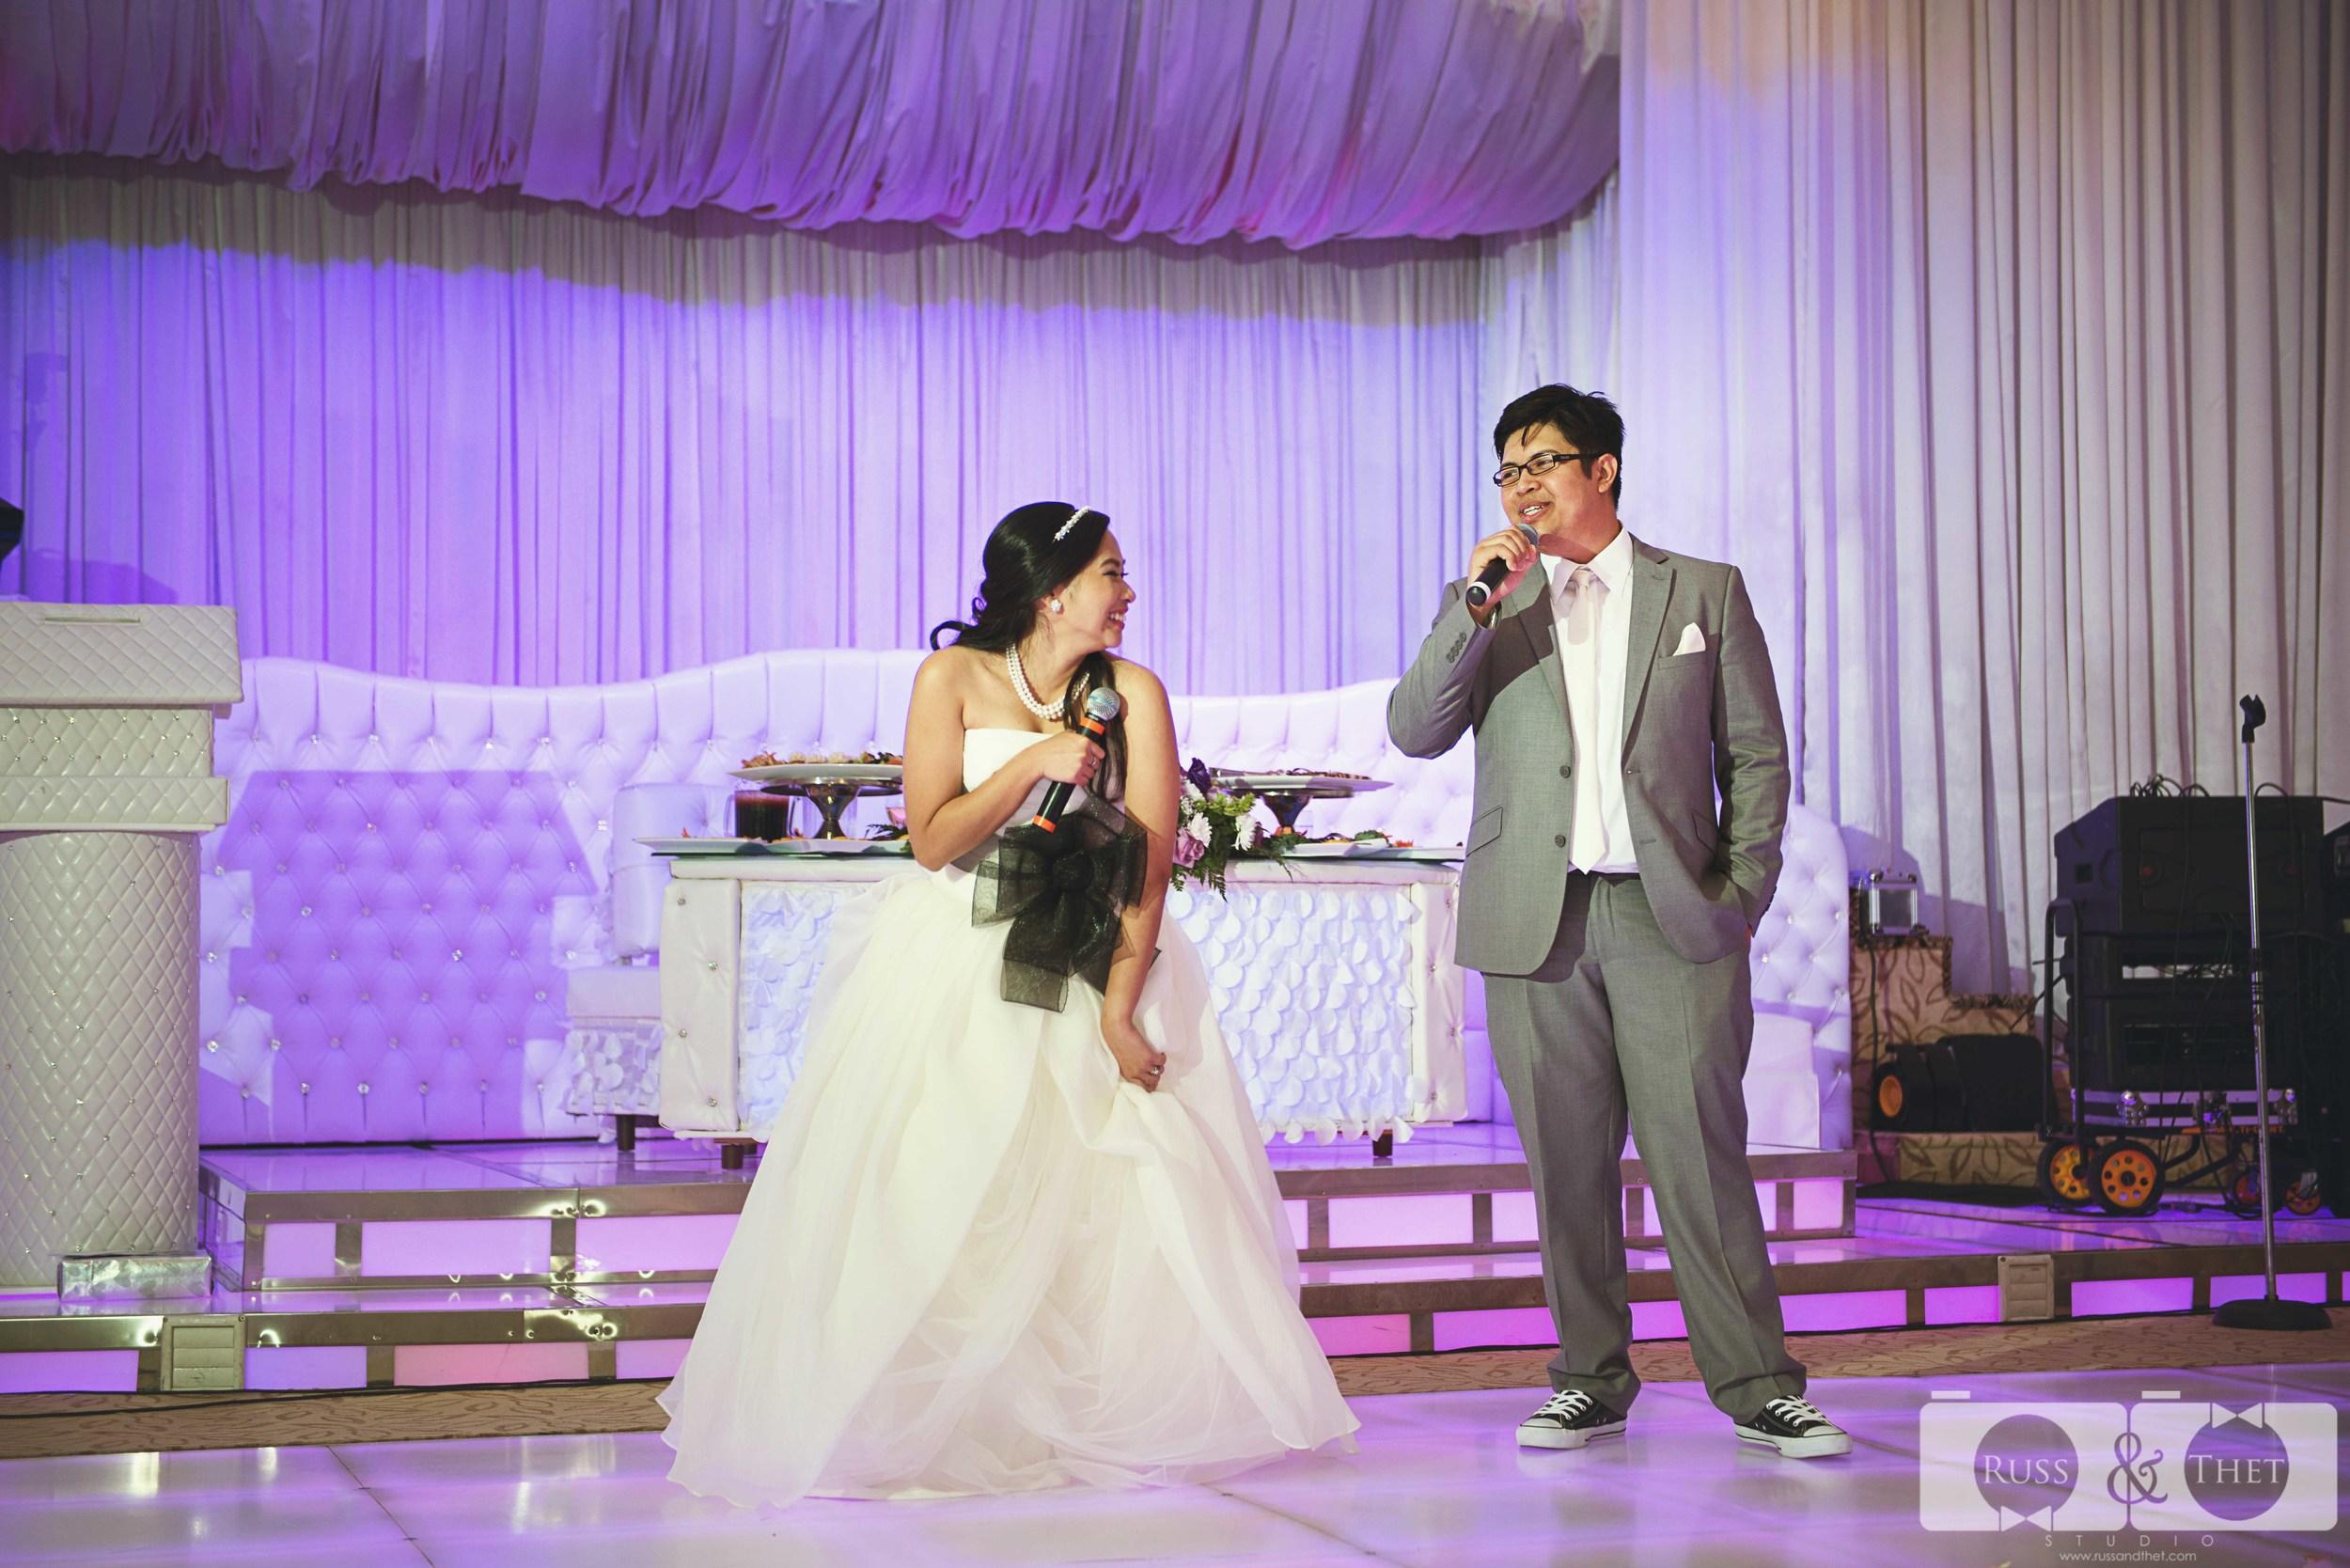 royal-palace-banquet-hall-glendale-wedding-72.JPG